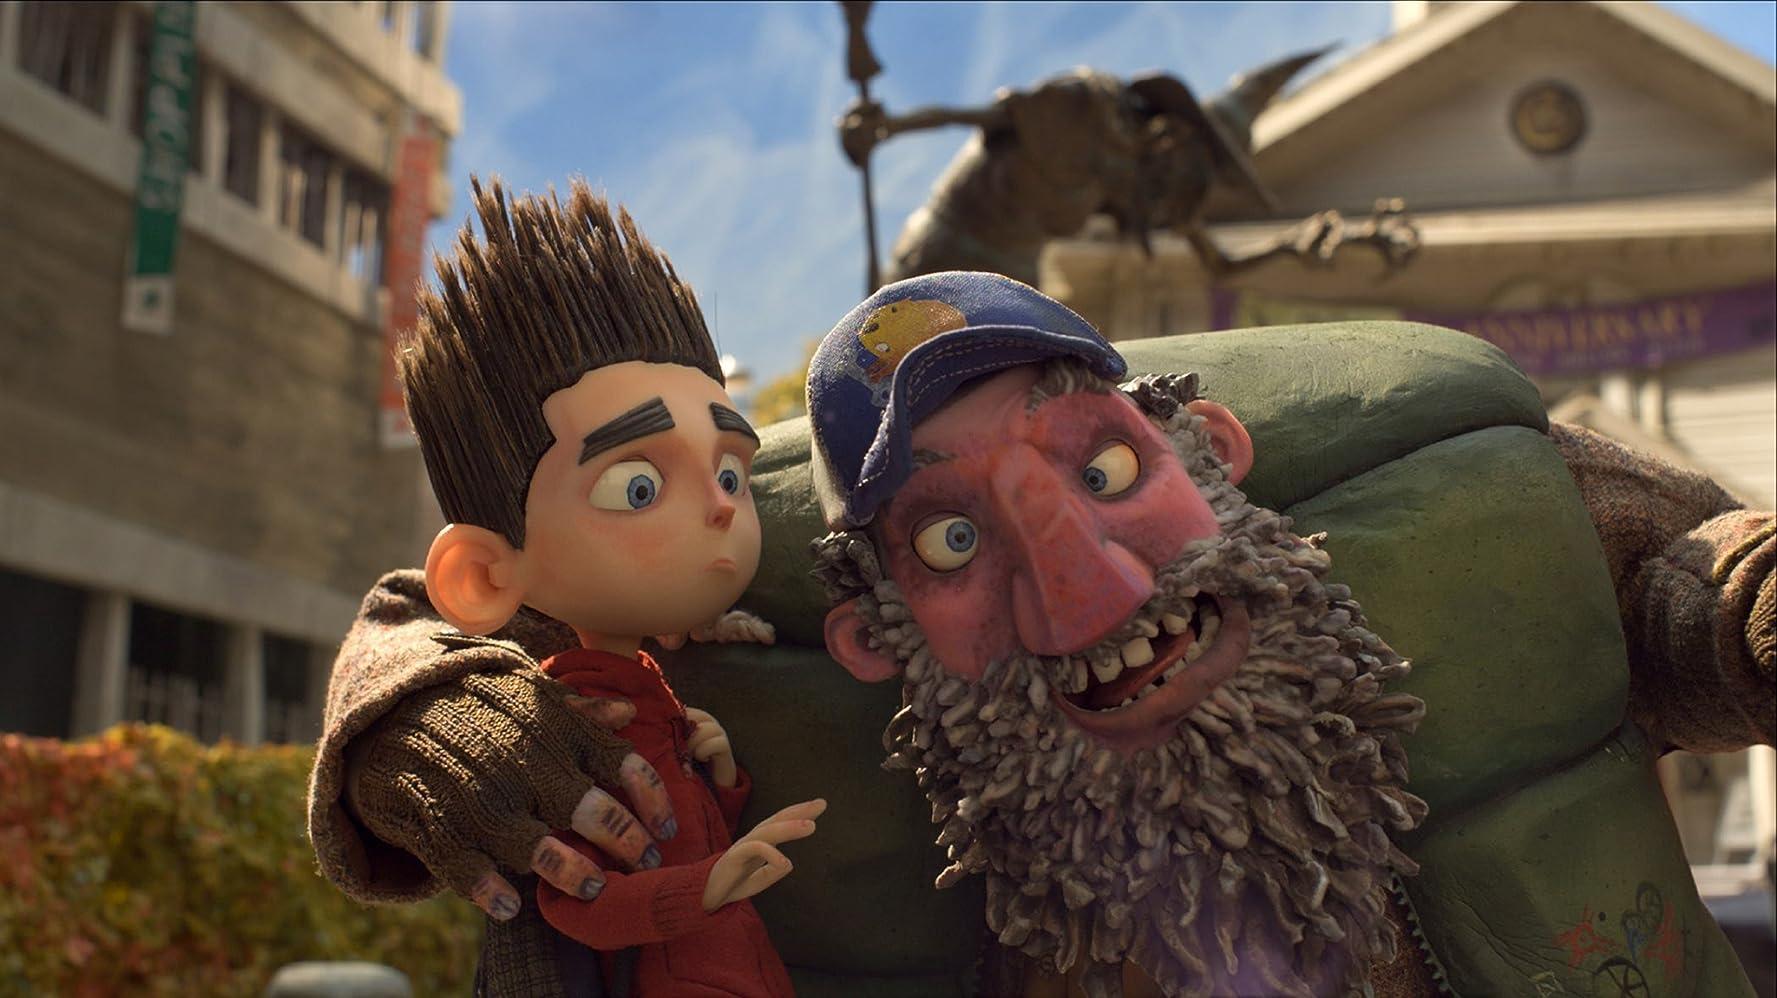 John Goodman and Kodi Smit-McPhee in ParaNorman (2012)